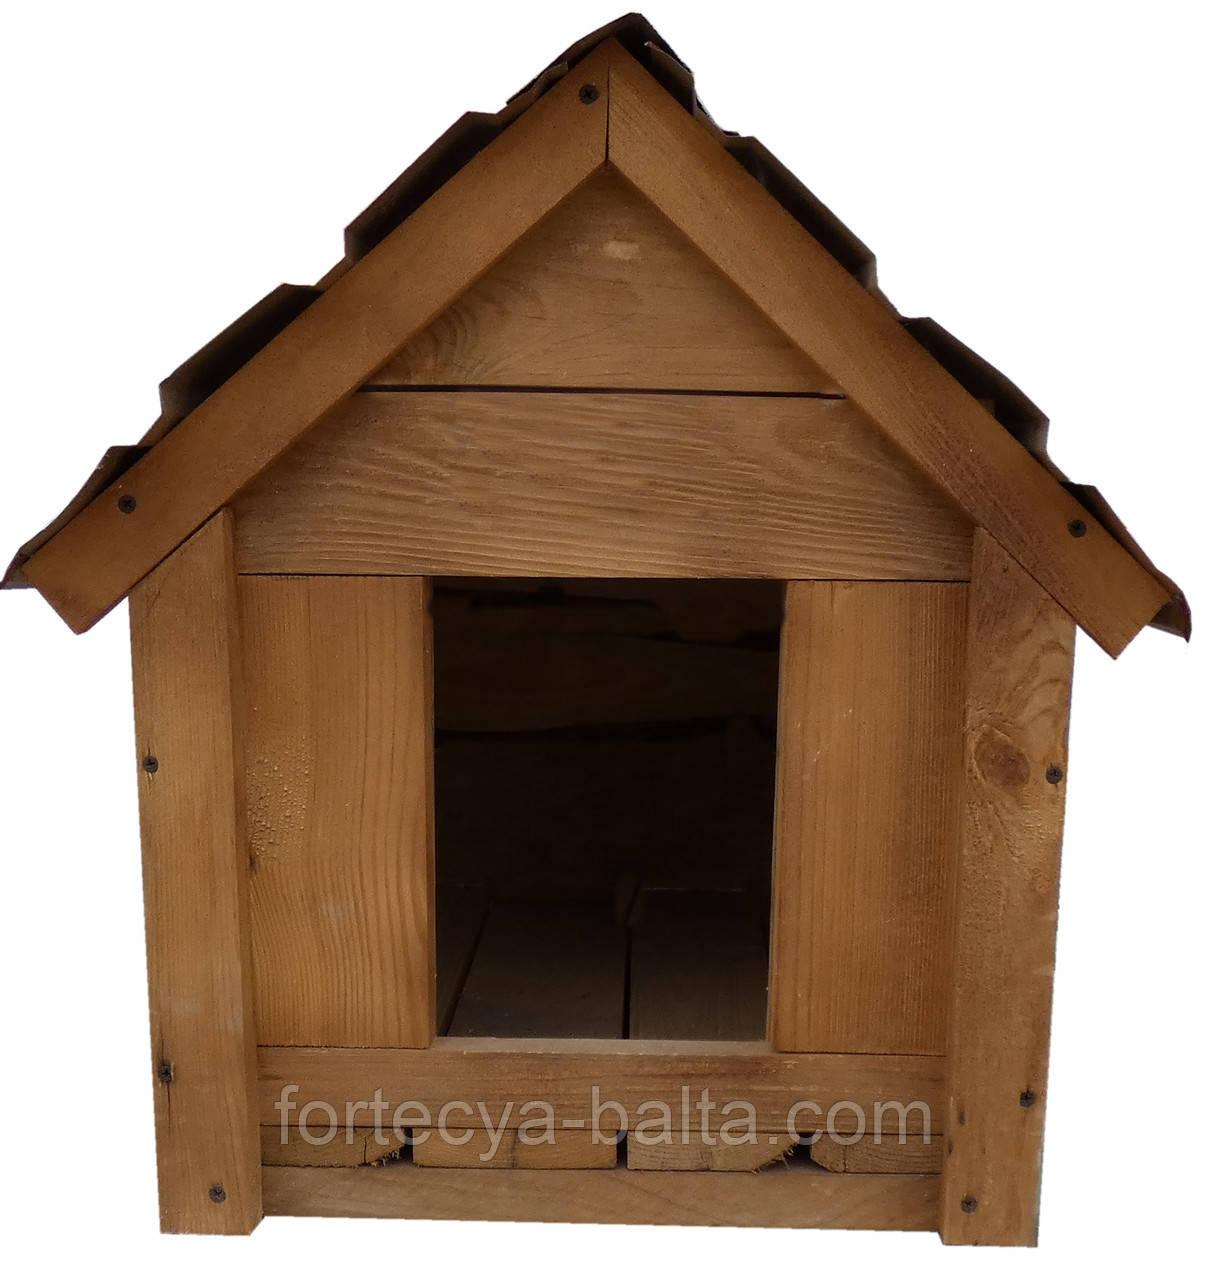 Будка для собака Фортеця №1 малая  540*390*540 сосна 9970662